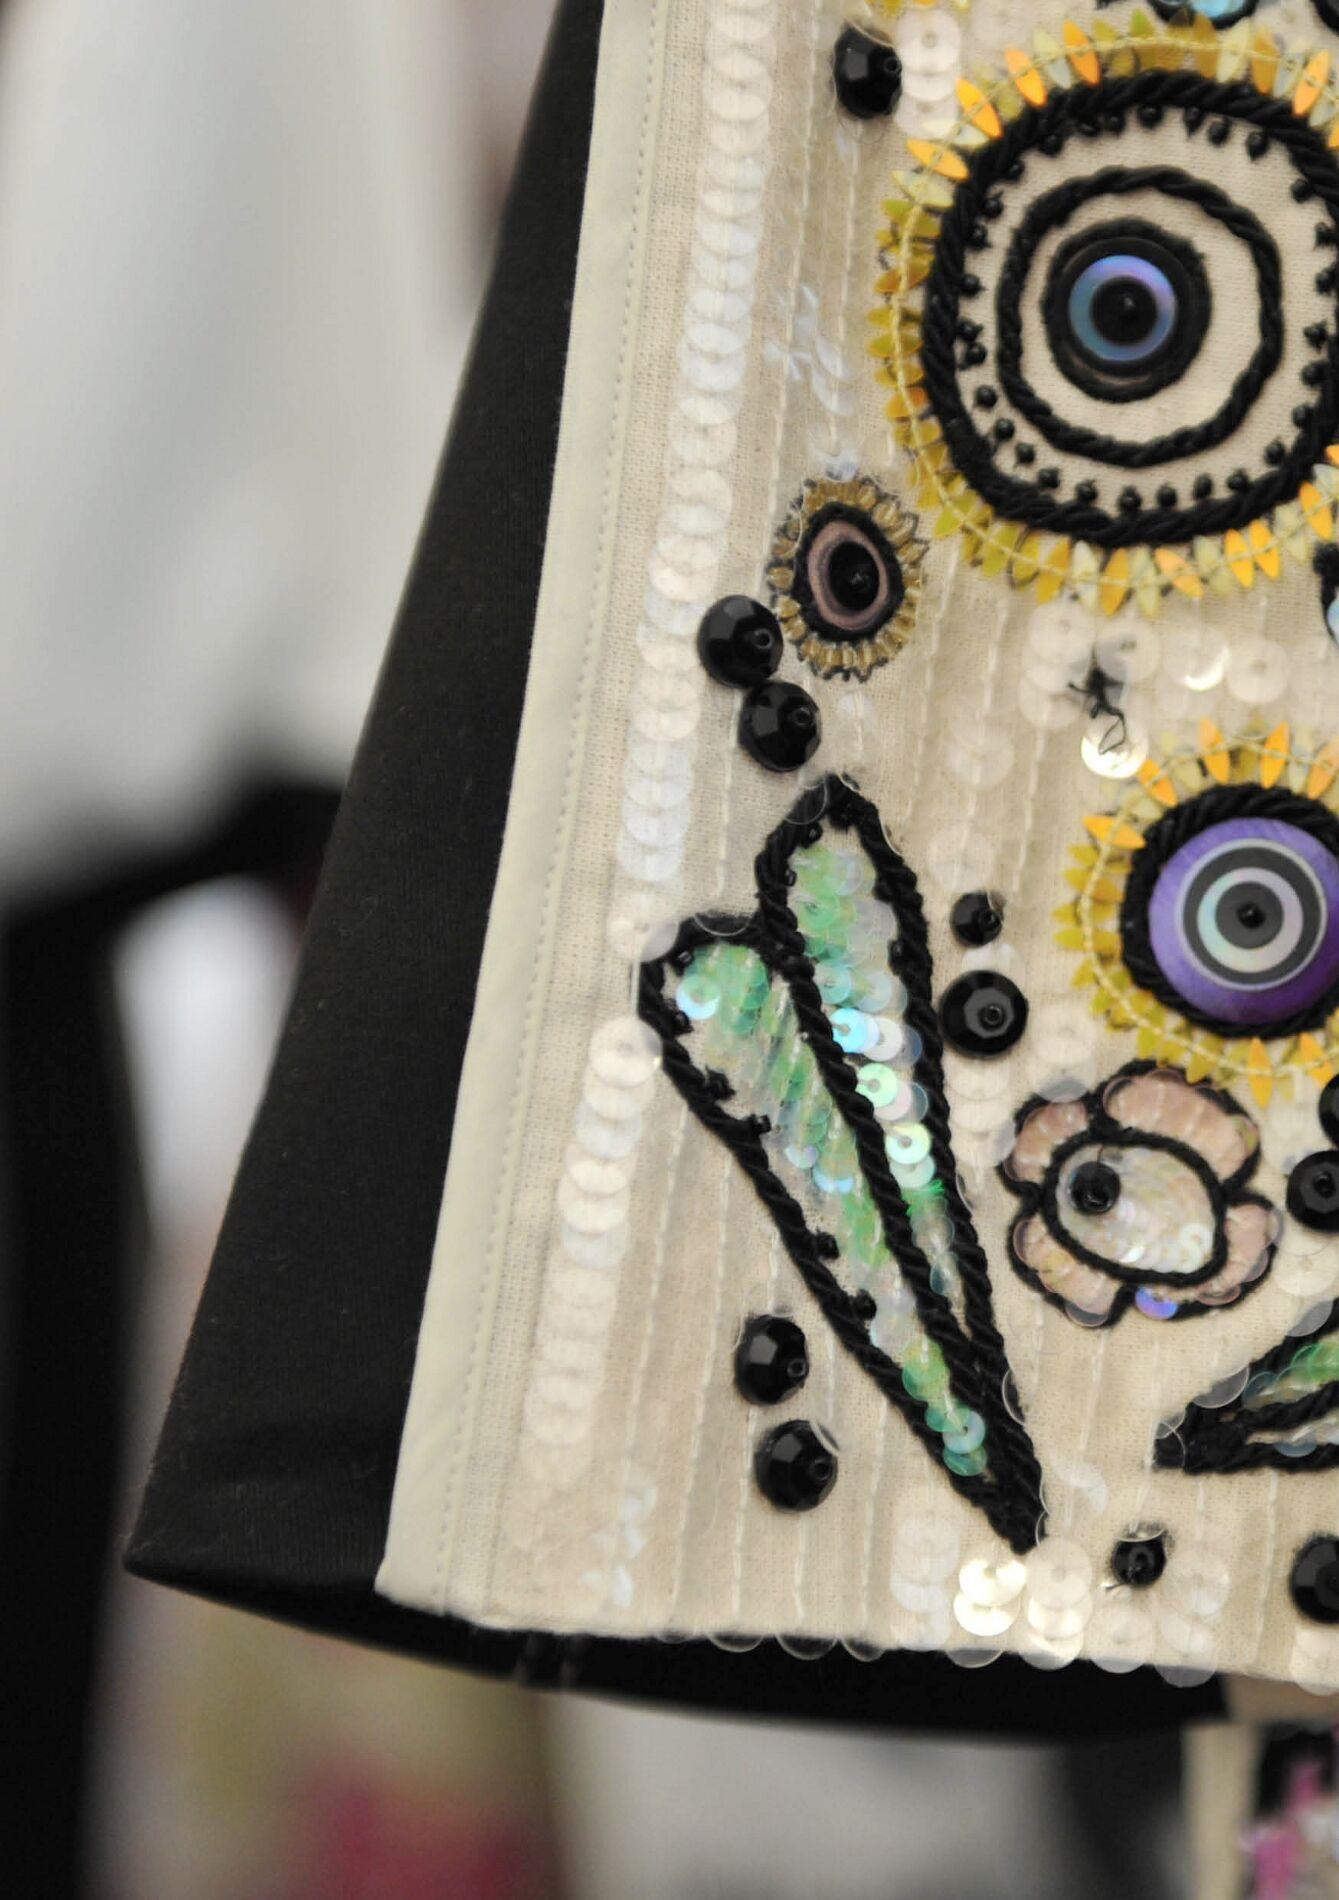 Antonio Marras Backstage Dress Detail